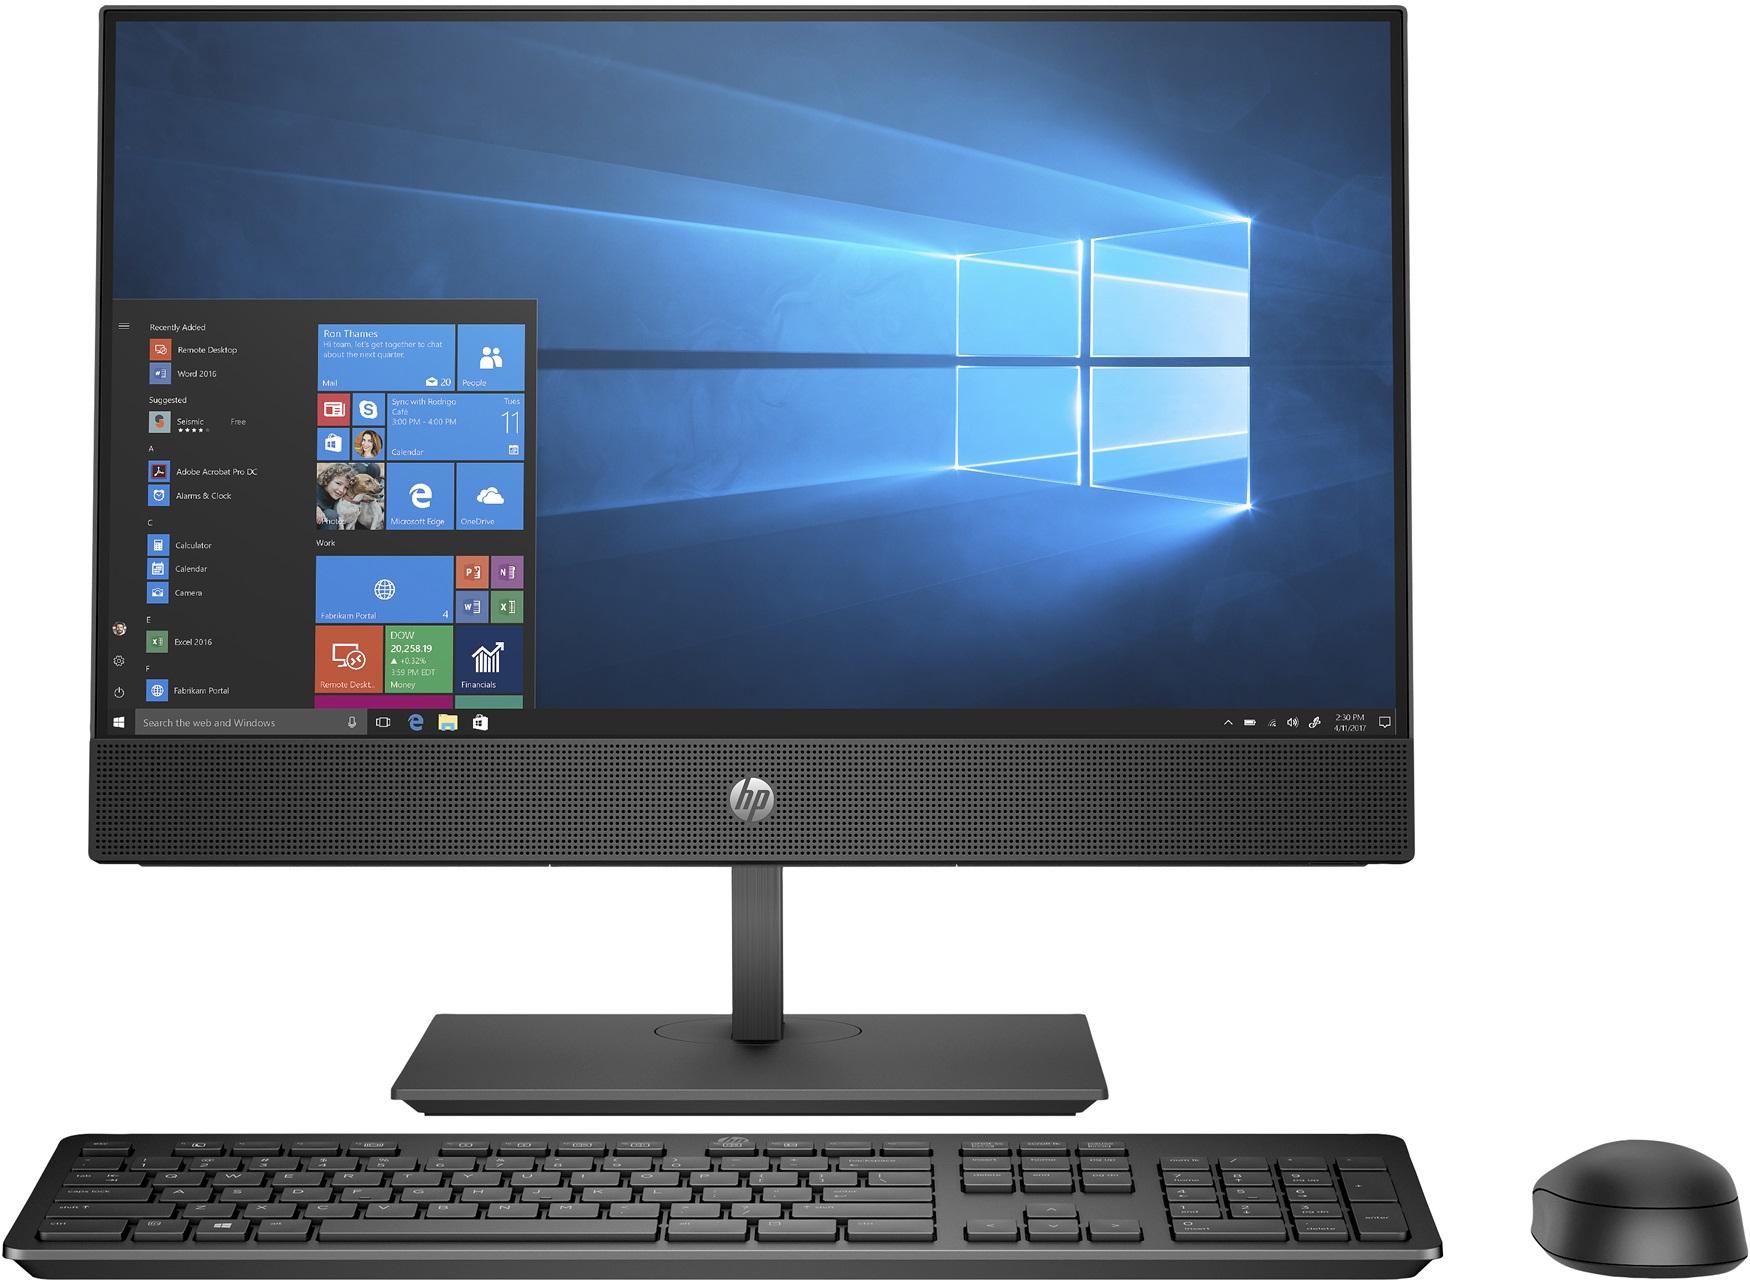 "HP ProOne 600 G4 + EliteDisplay E223 2.1GHz i5-8500T 8th gen Intel® Core™ i5 21.5"" 1920 x 1080pixels Touchscreen Black All-in-One PC"